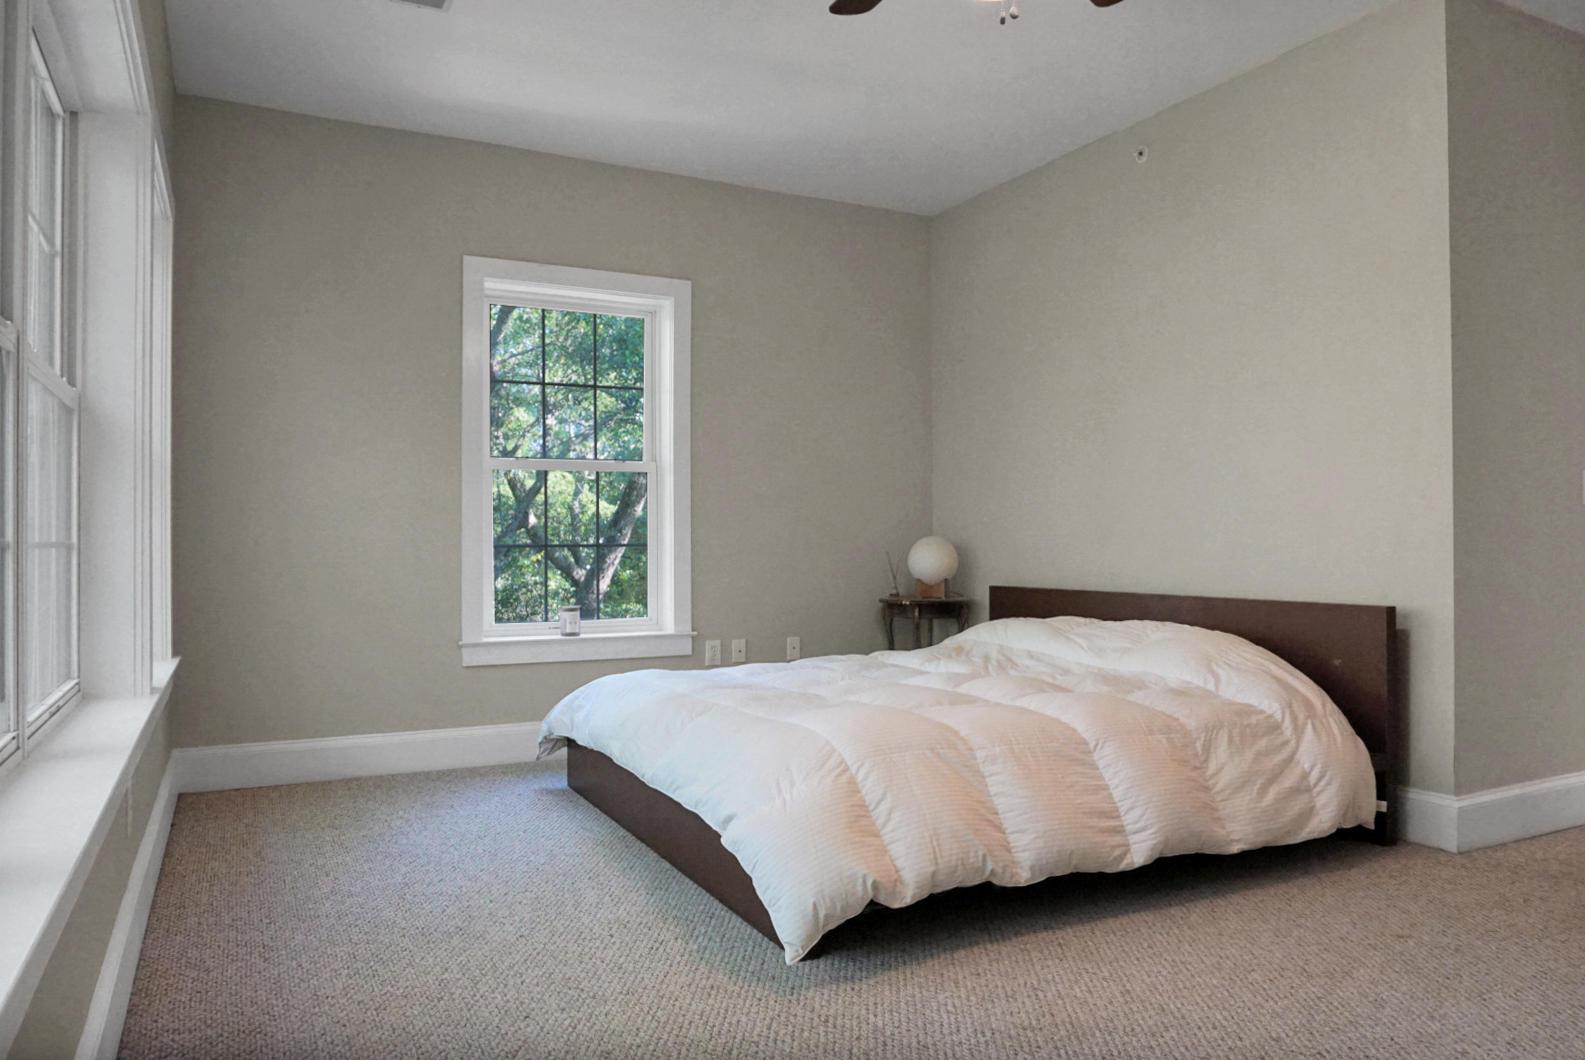 Etiwan Pointe Homes For Sale - 269 Etiwan Pointe, Mount Pleasant, SC - 30